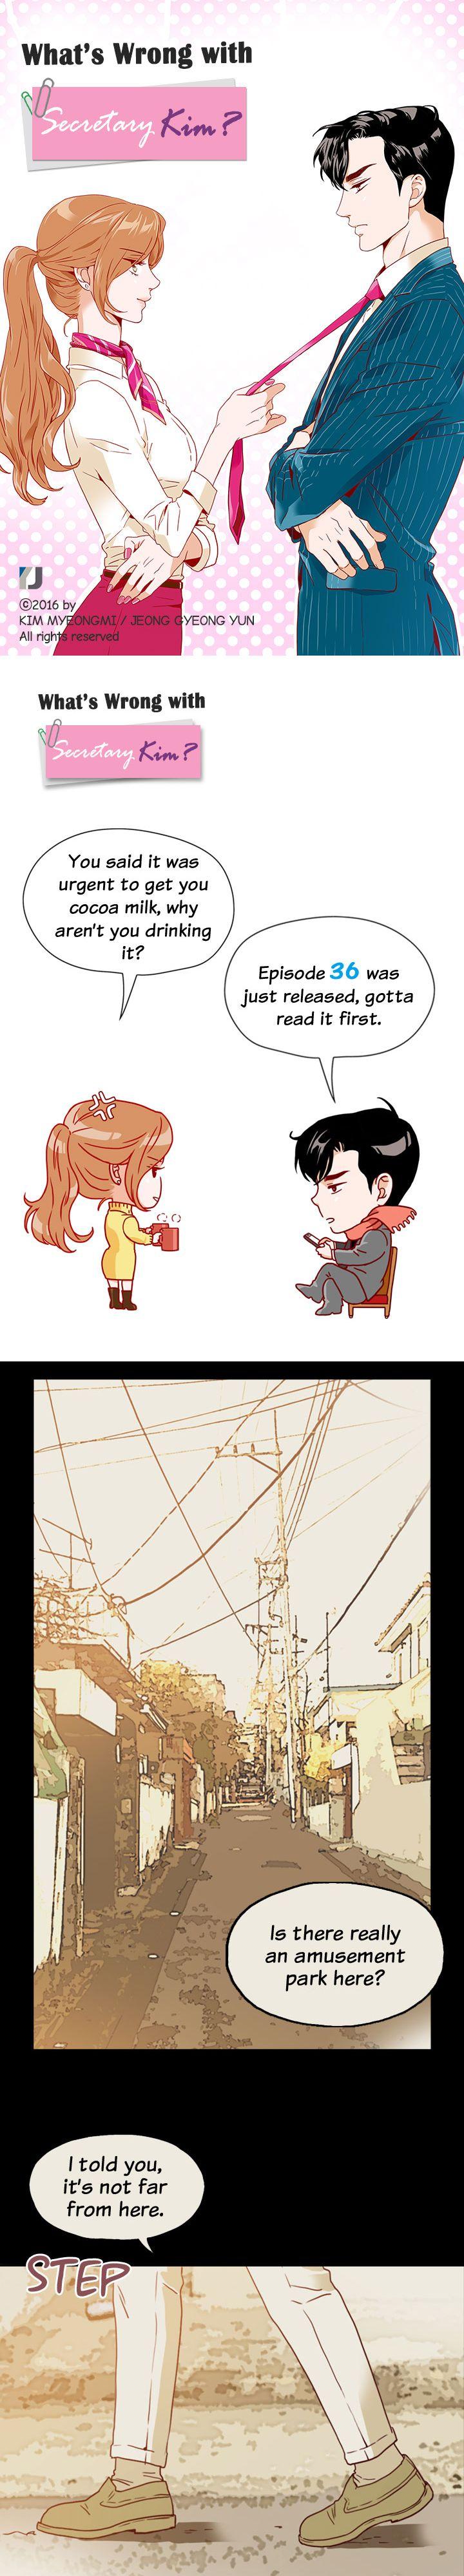 https://manga.mangadogs.com/comics/pic2/15/25807/960693/f8ad9376a980baba97b371dee97f7912.jpg Page 1